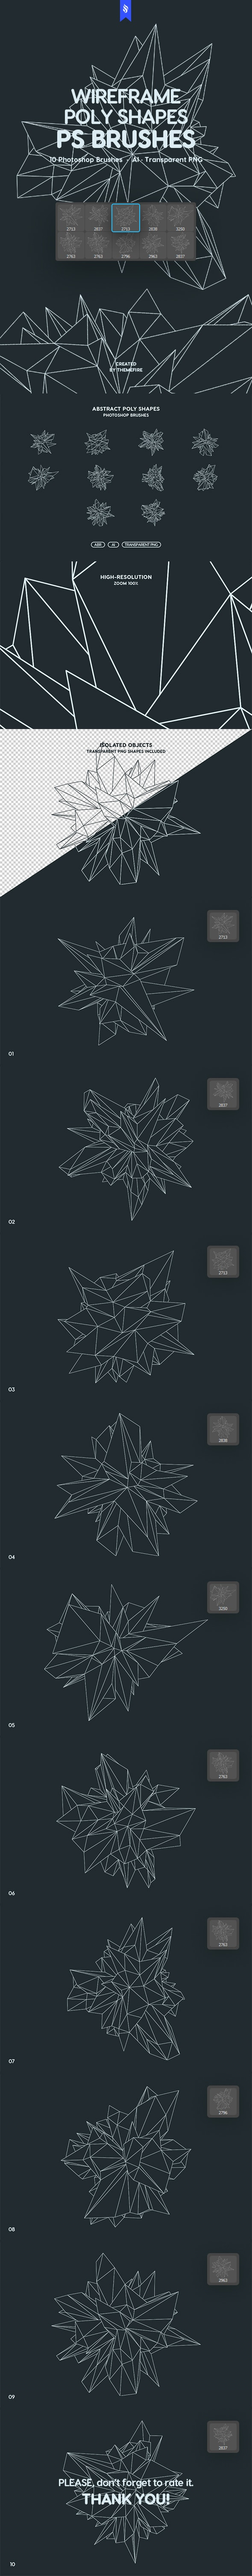 Wireframe Polygonal Shapes Photoshop Brushes - Abstract Brushes